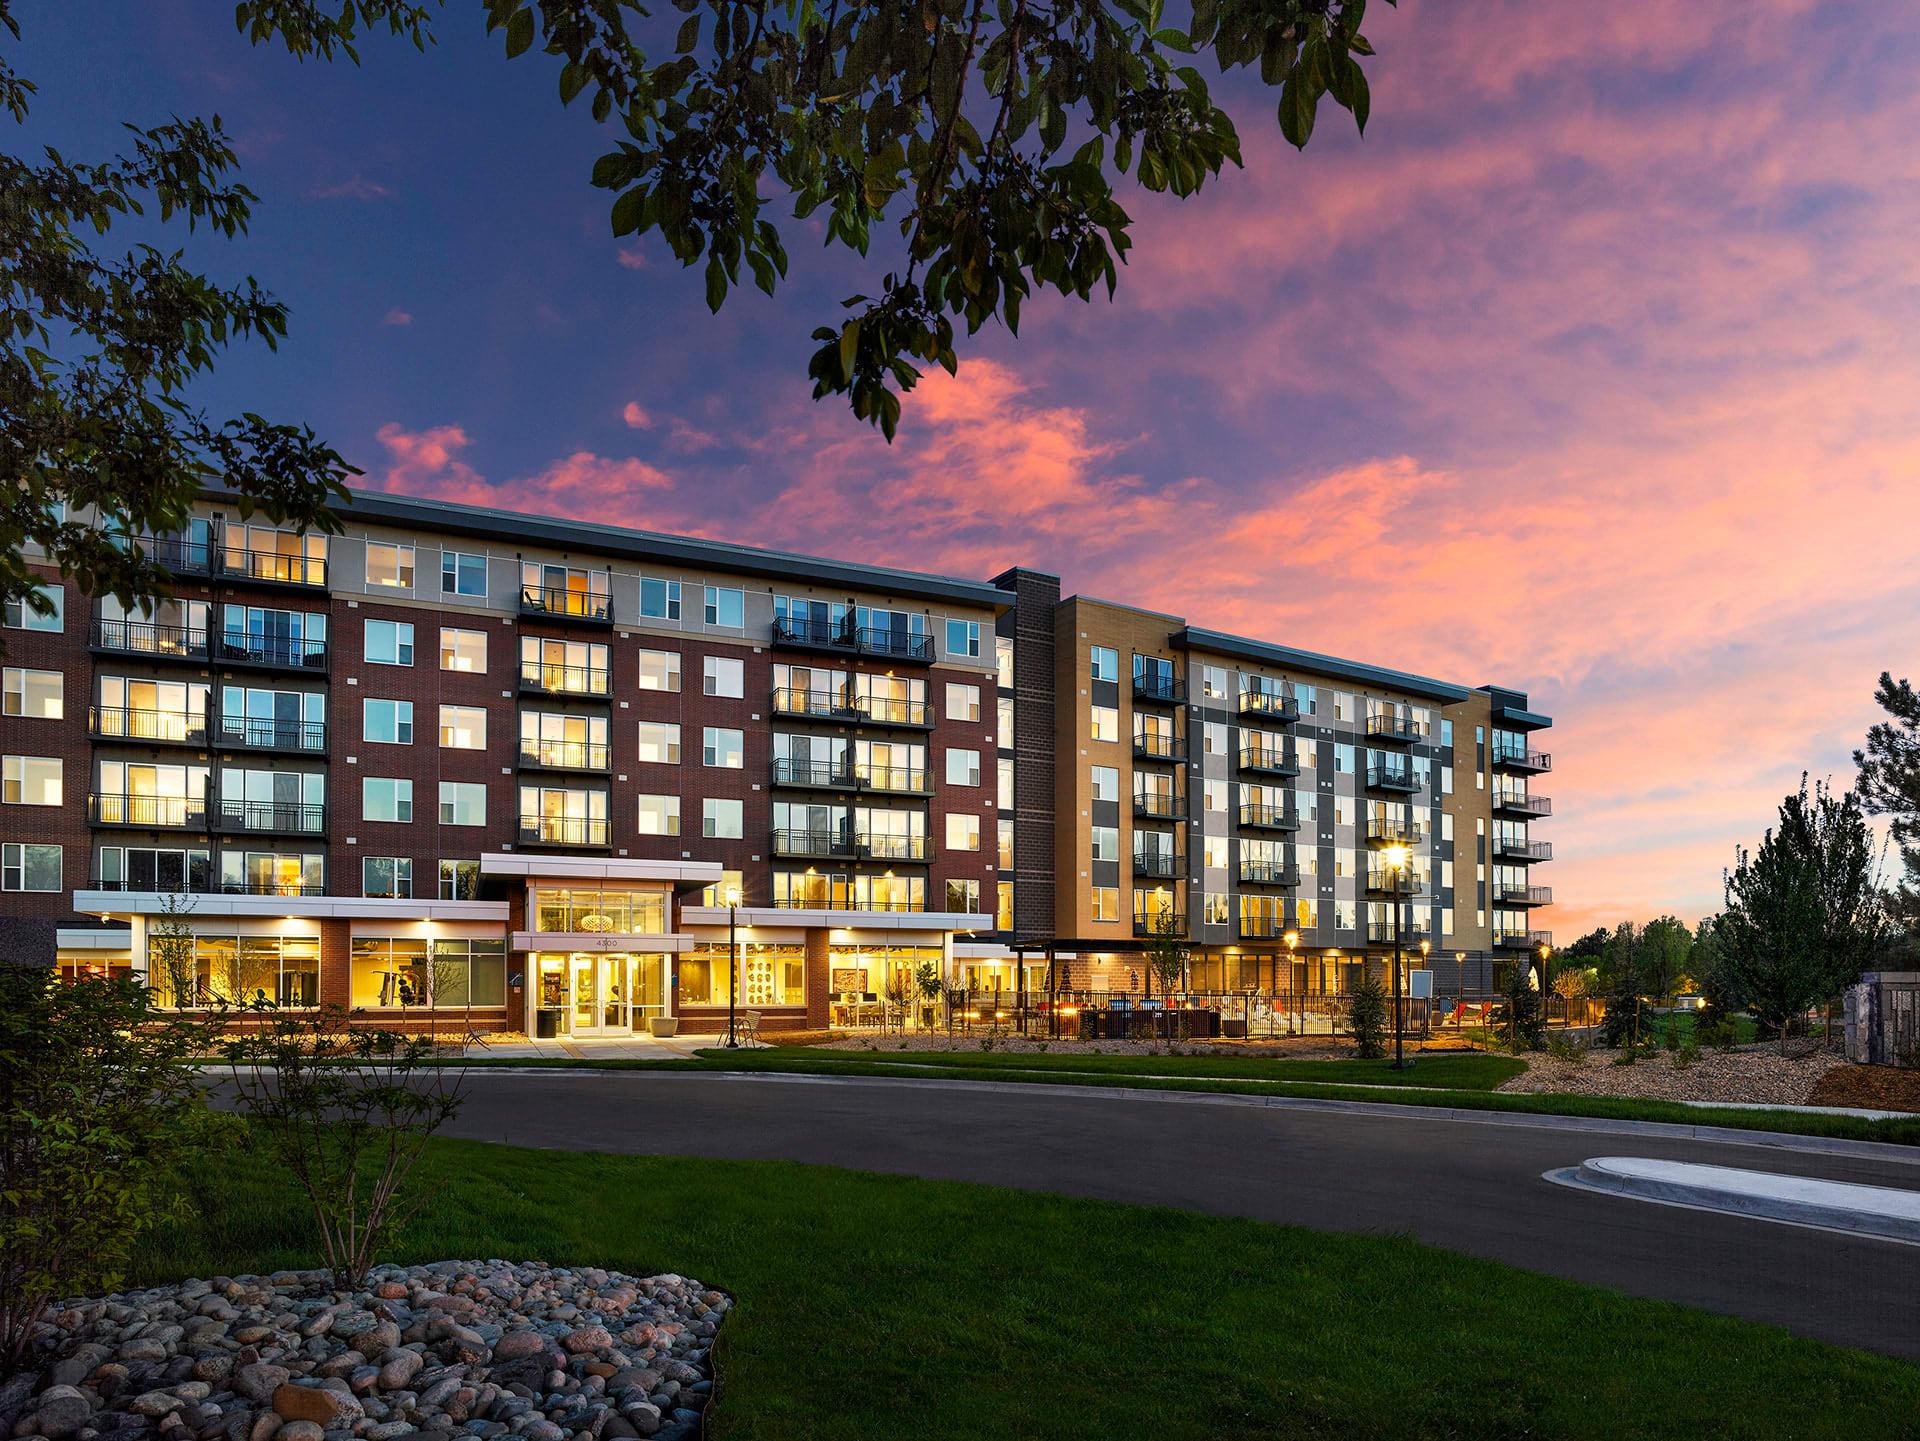 Apartments In Hampden South Denver Co See Photos Floor Plans More